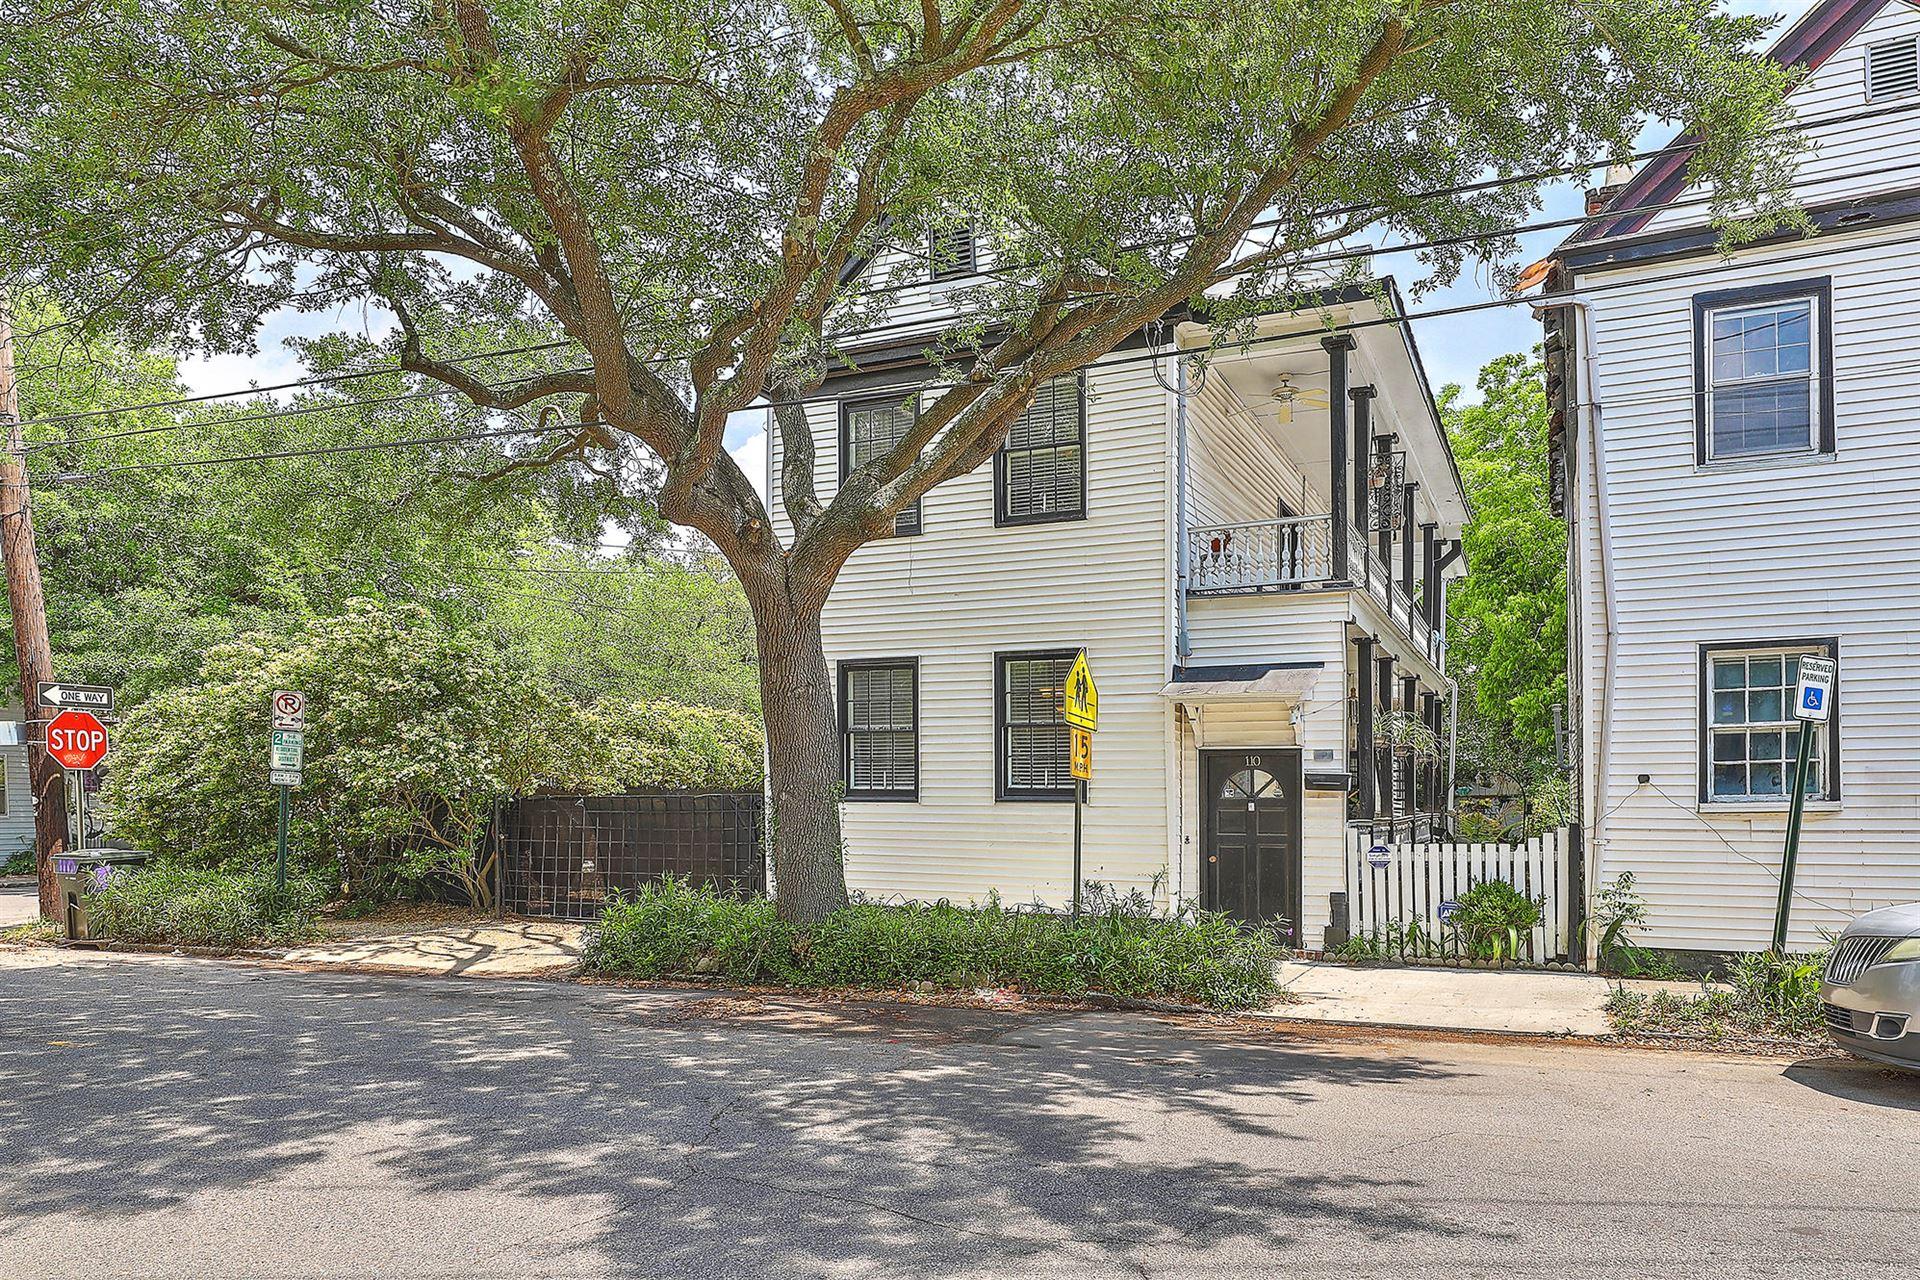 Photo of 110 America Street, Charleston, SC 29403 (MLS # 21012317)